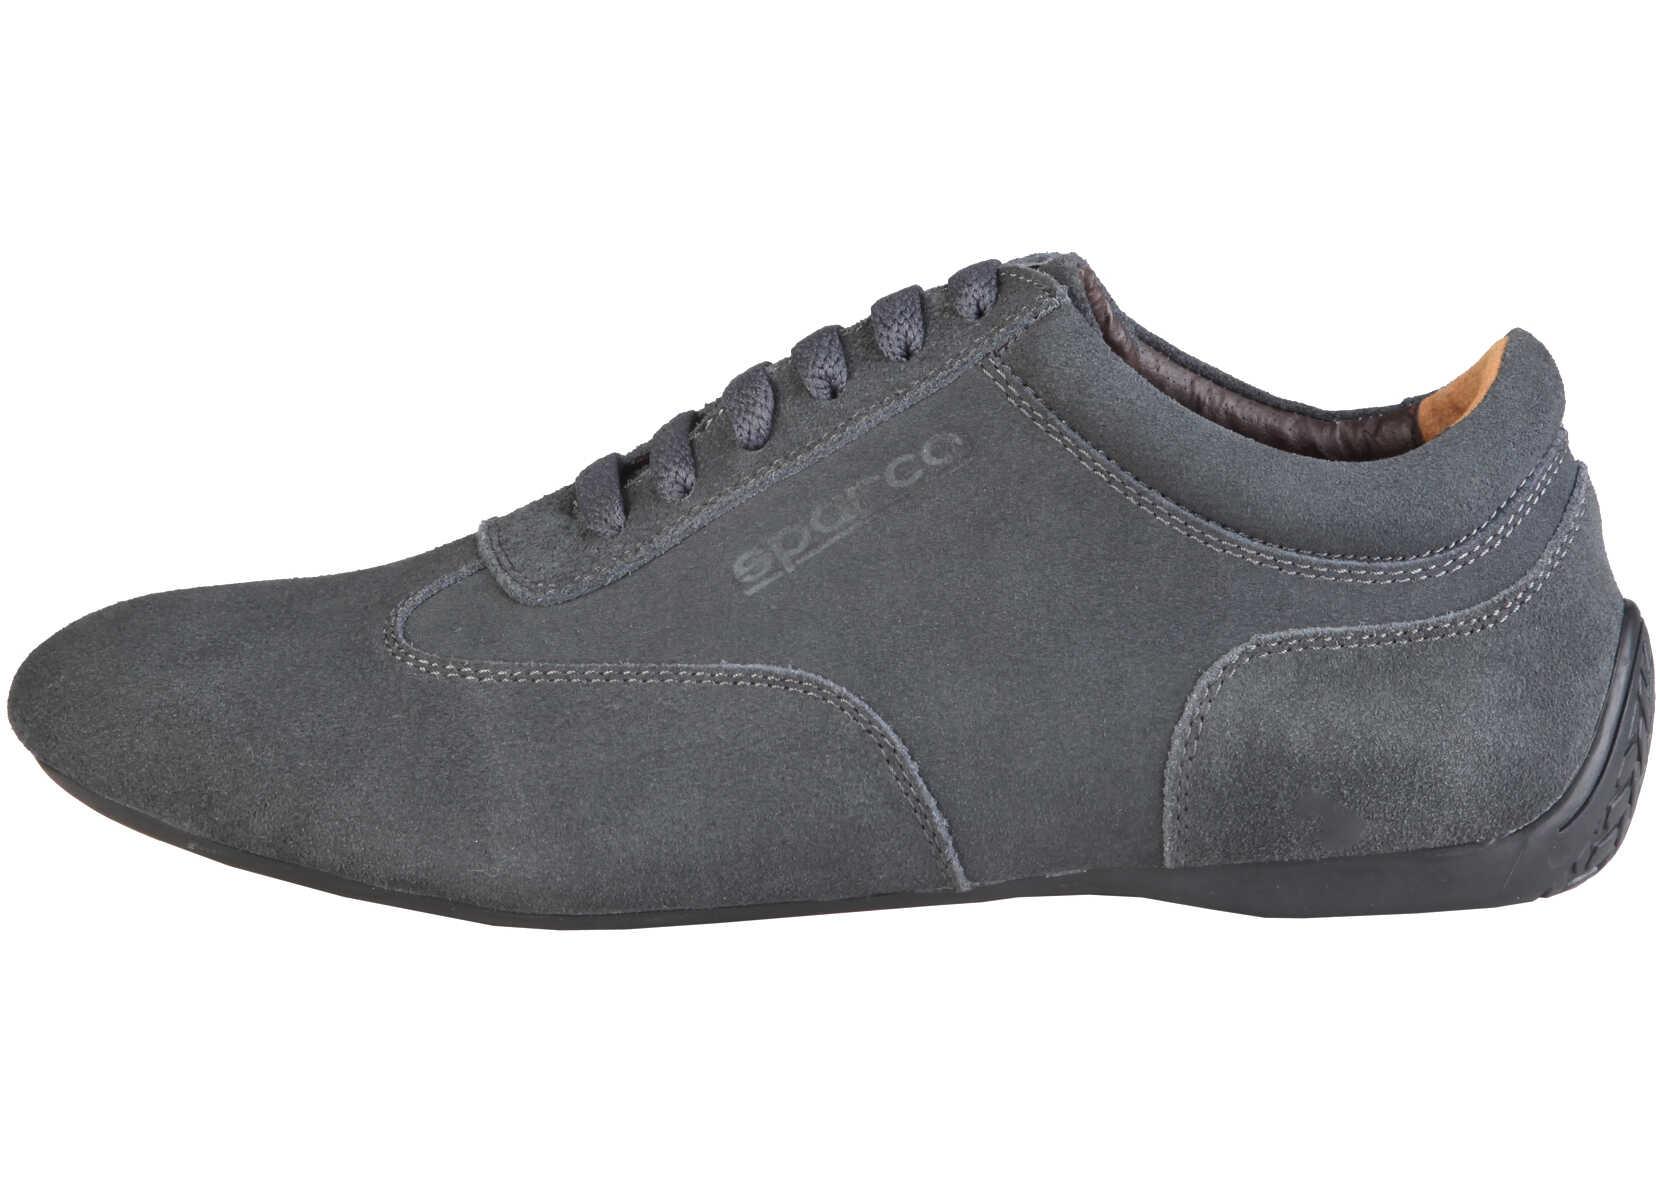 Sparco Imola* Grey